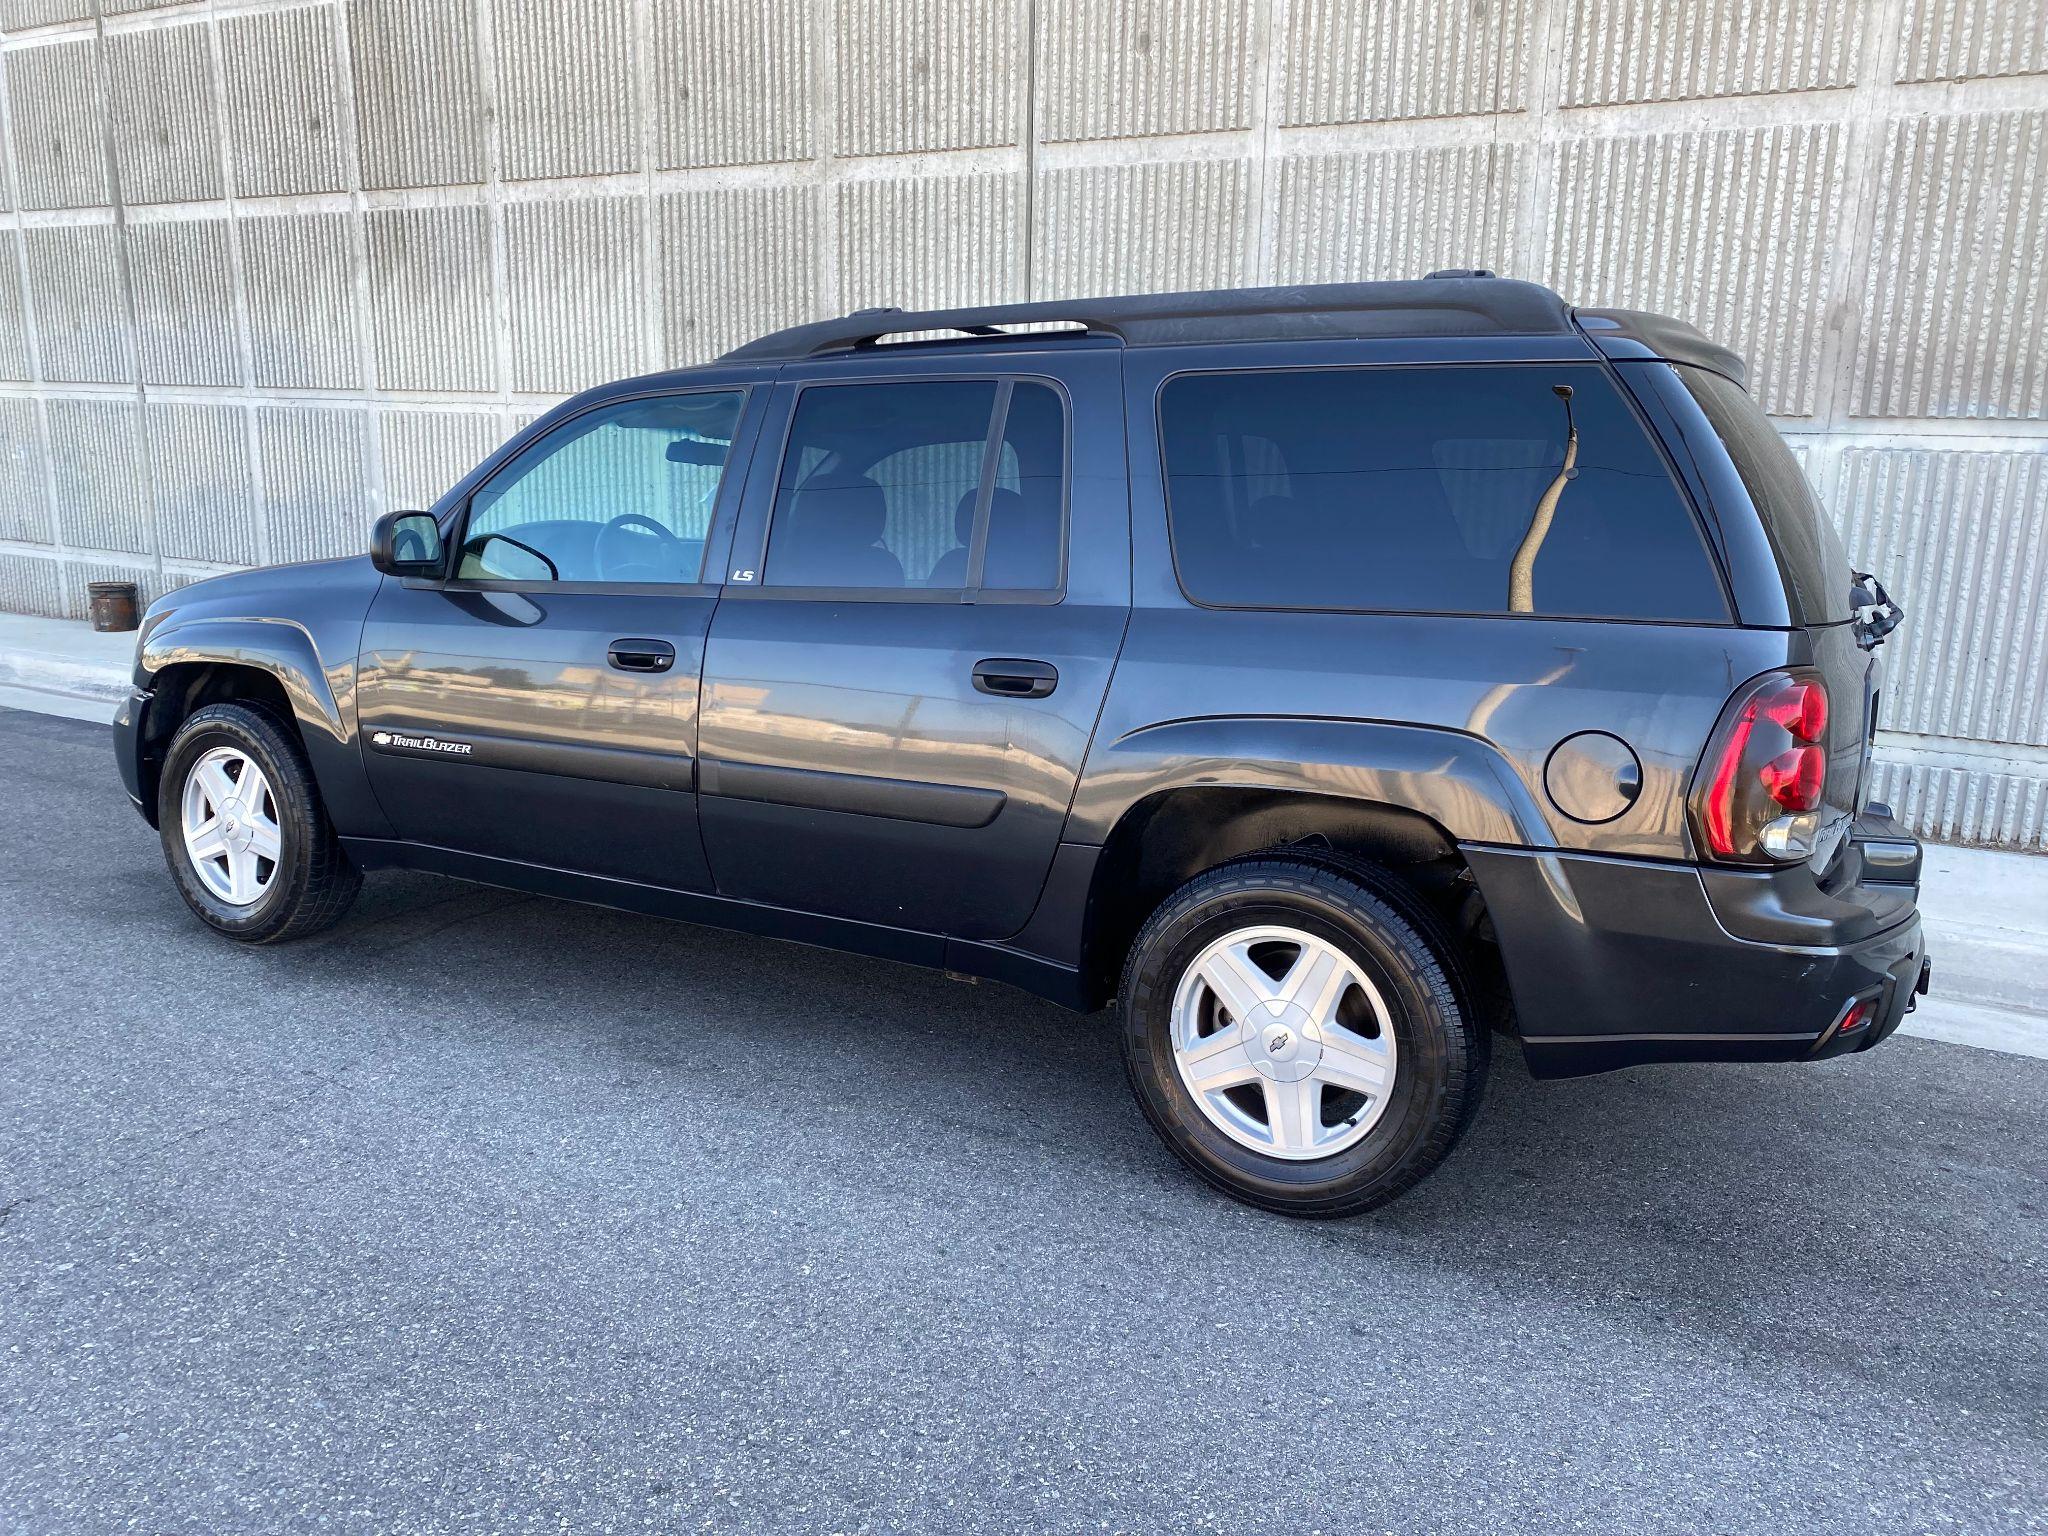 2003 Chevrolet TrailBlazer EXT LS